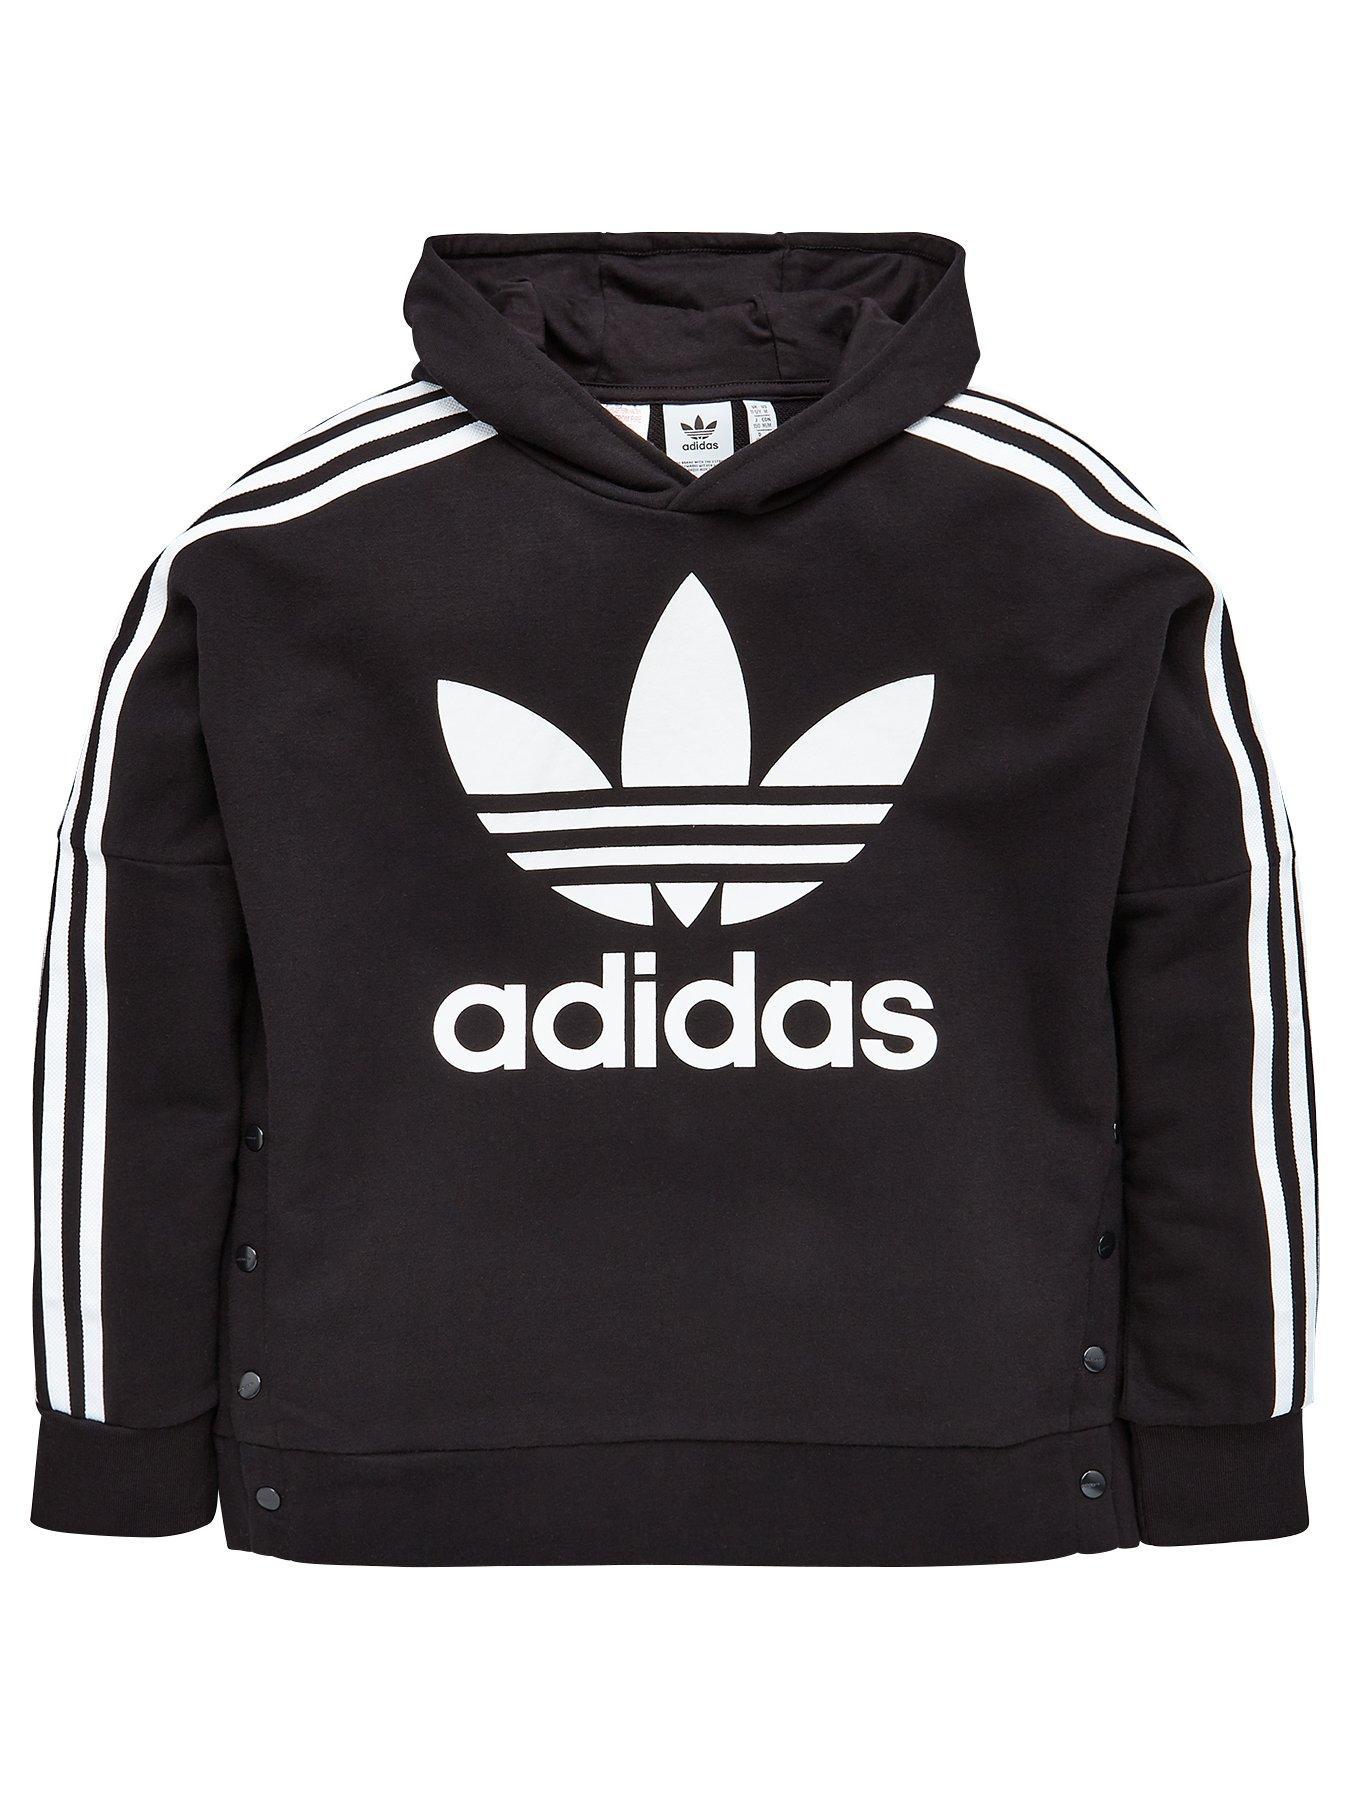 amp; Very Sportswear Baby uk Child Hoodies co Sweatshirts 8Bxd8q